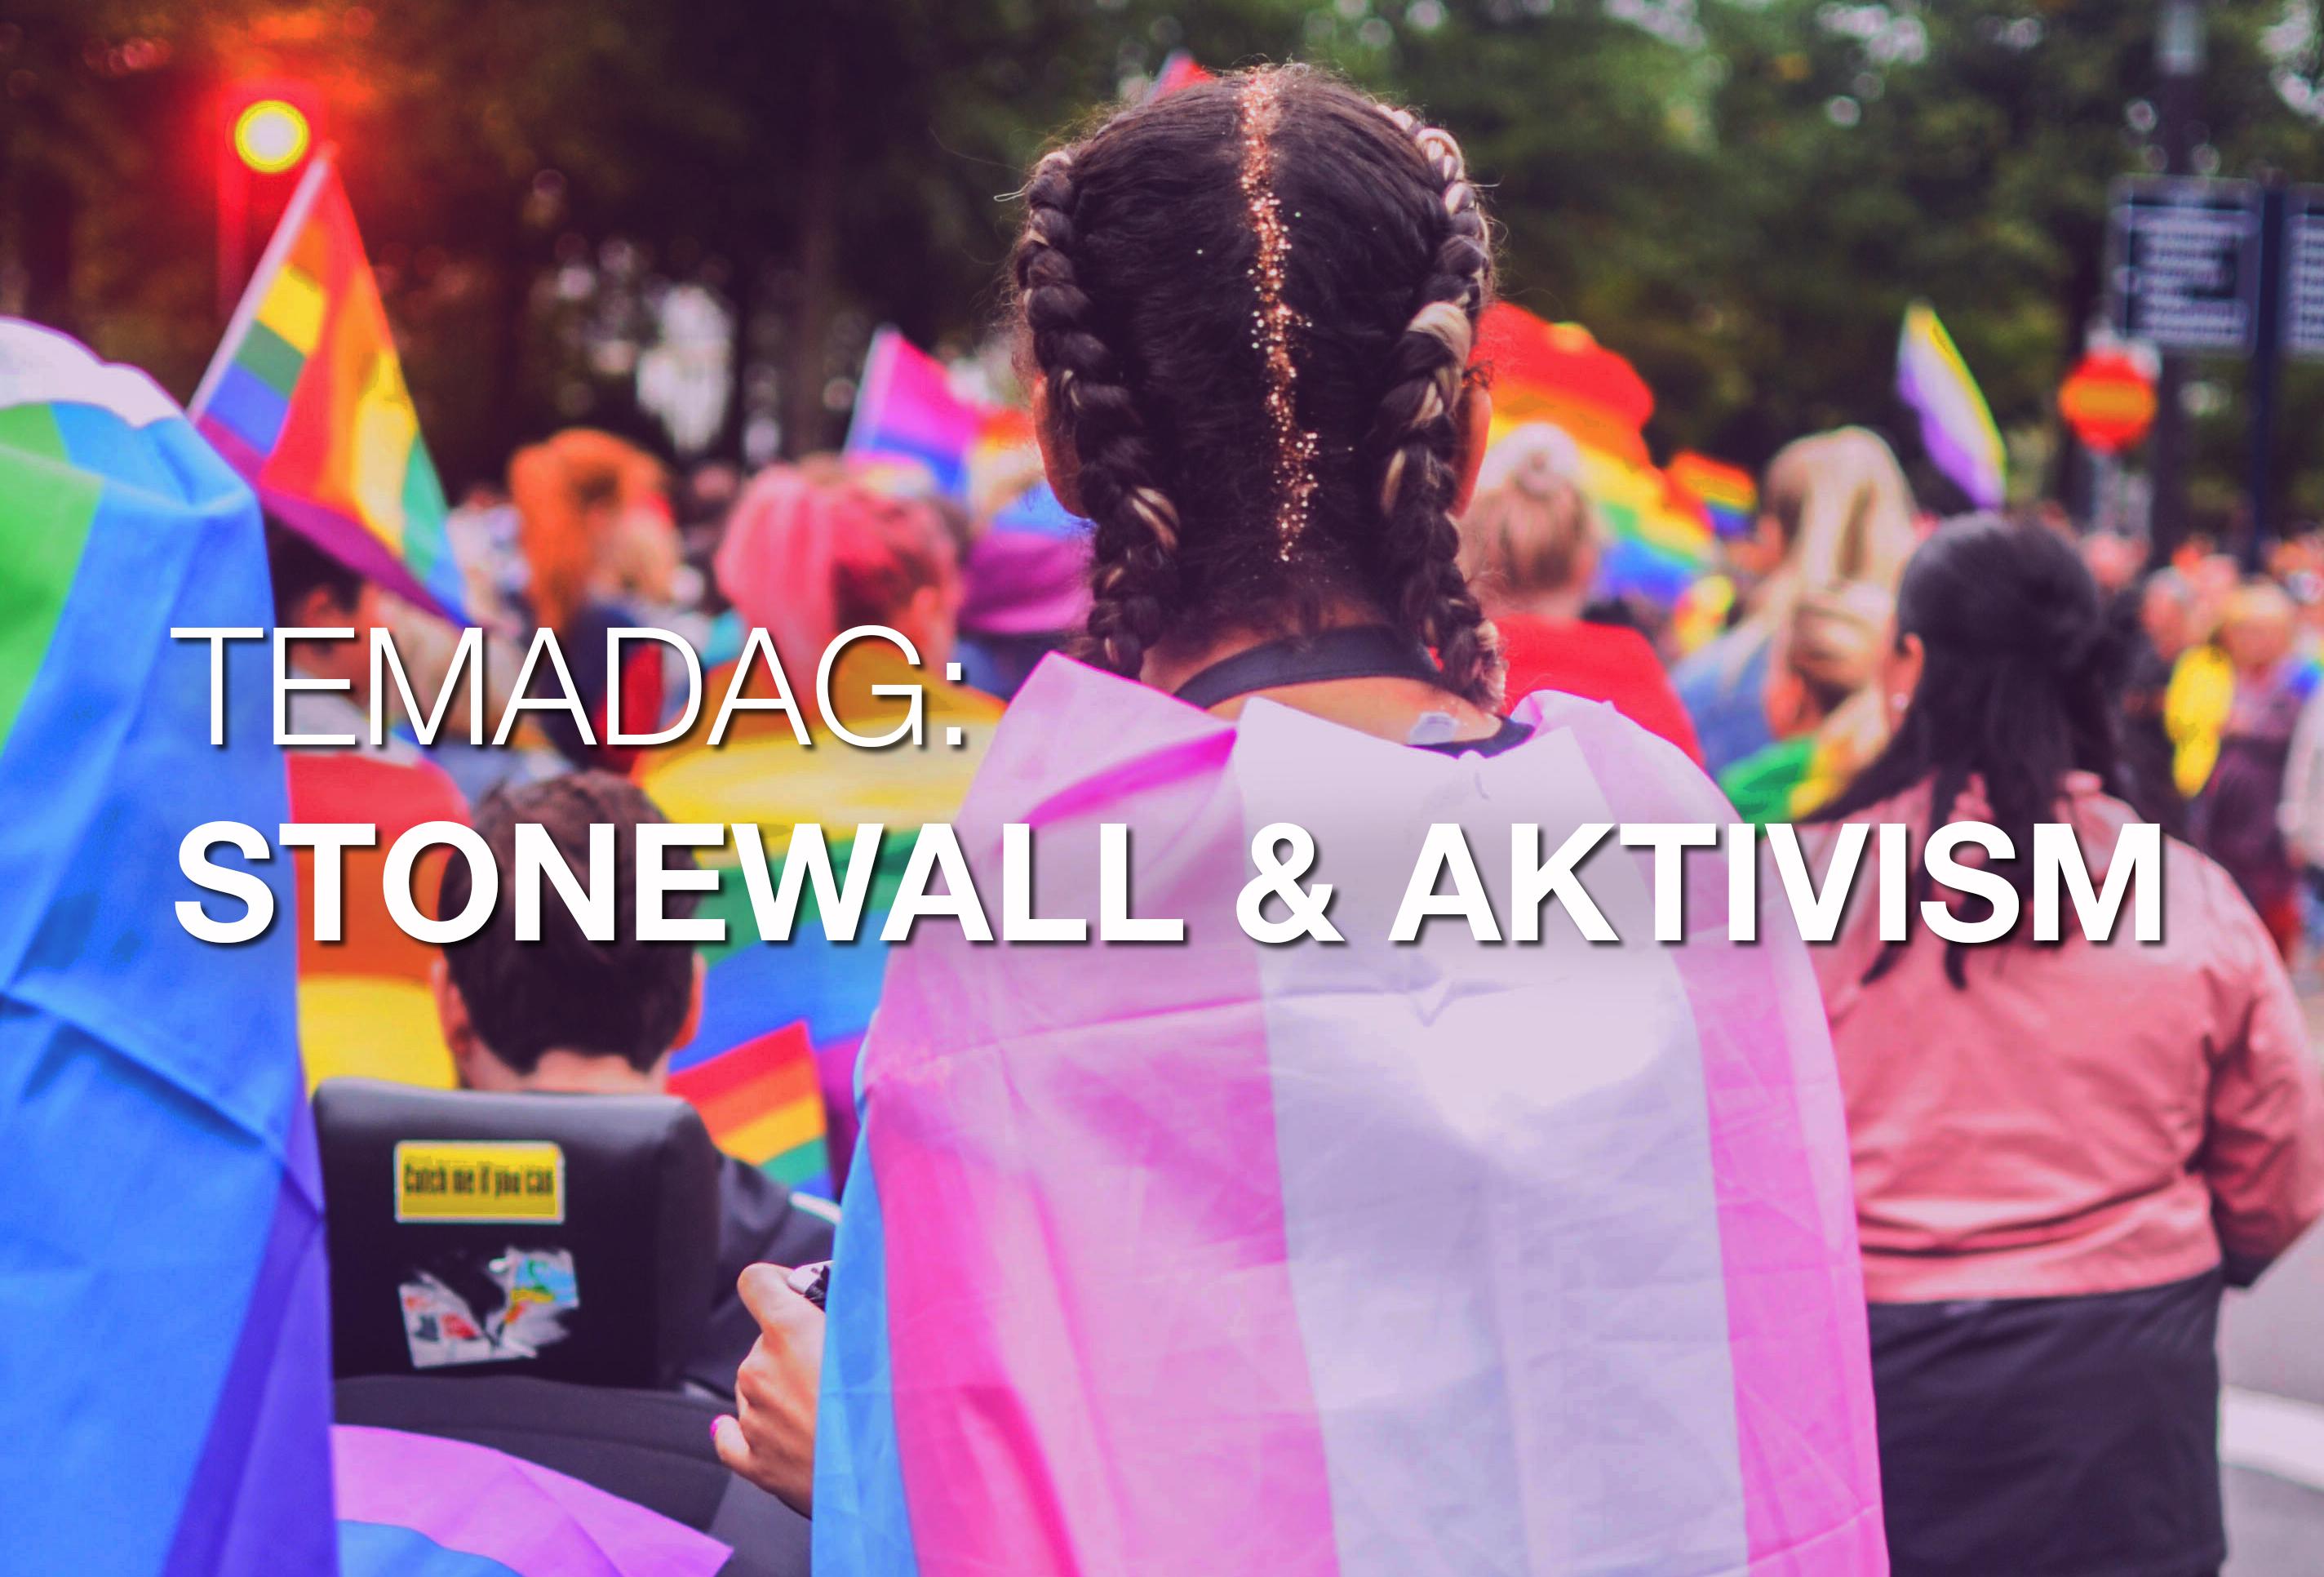 Temadag: Stonewall & aktivism